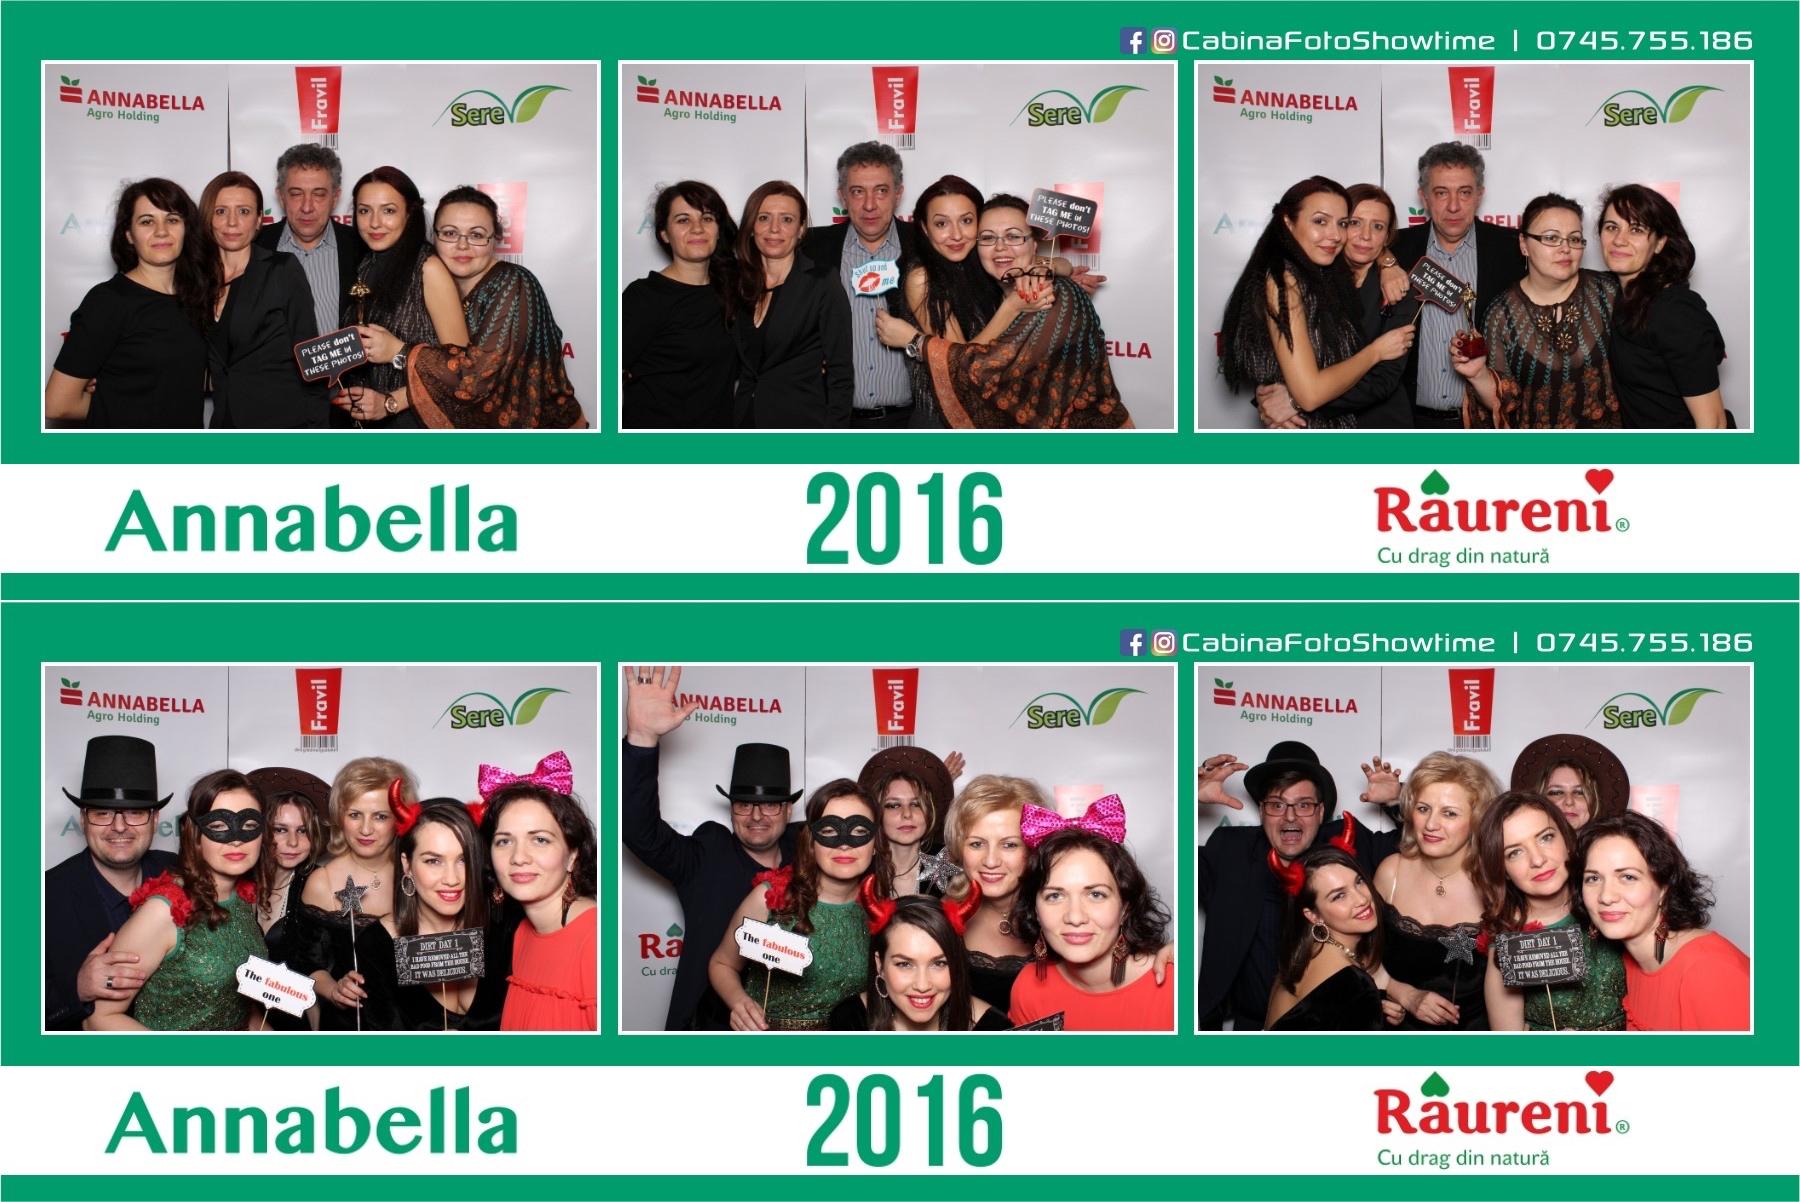 Cabina Foto Showtime 2017 - Event Factory - Dj Vladu - Ramnicu Valcea - Nunta Botez Aniversare Majorat Eveniment Privat - Annabella Party